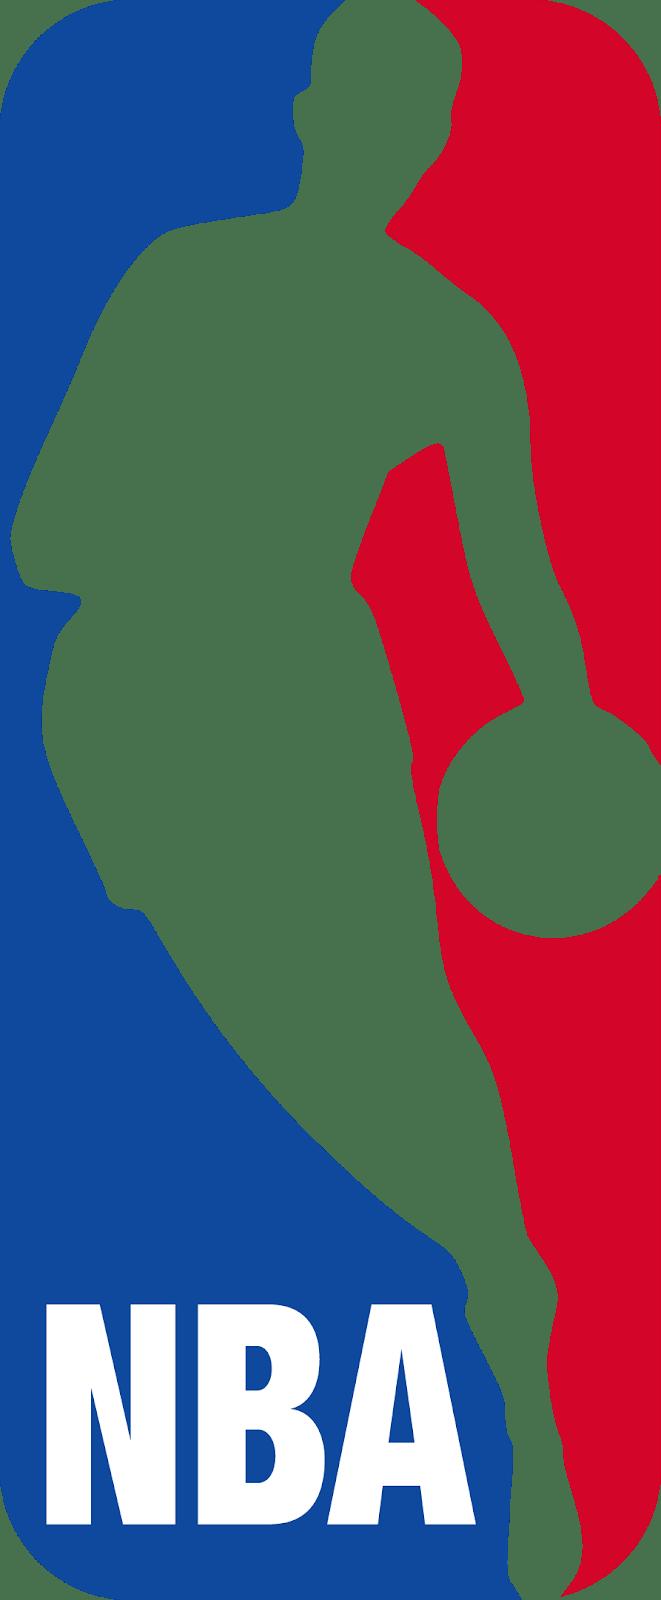 Create Custom Logos with a Basketball Logo Maker | Placeit